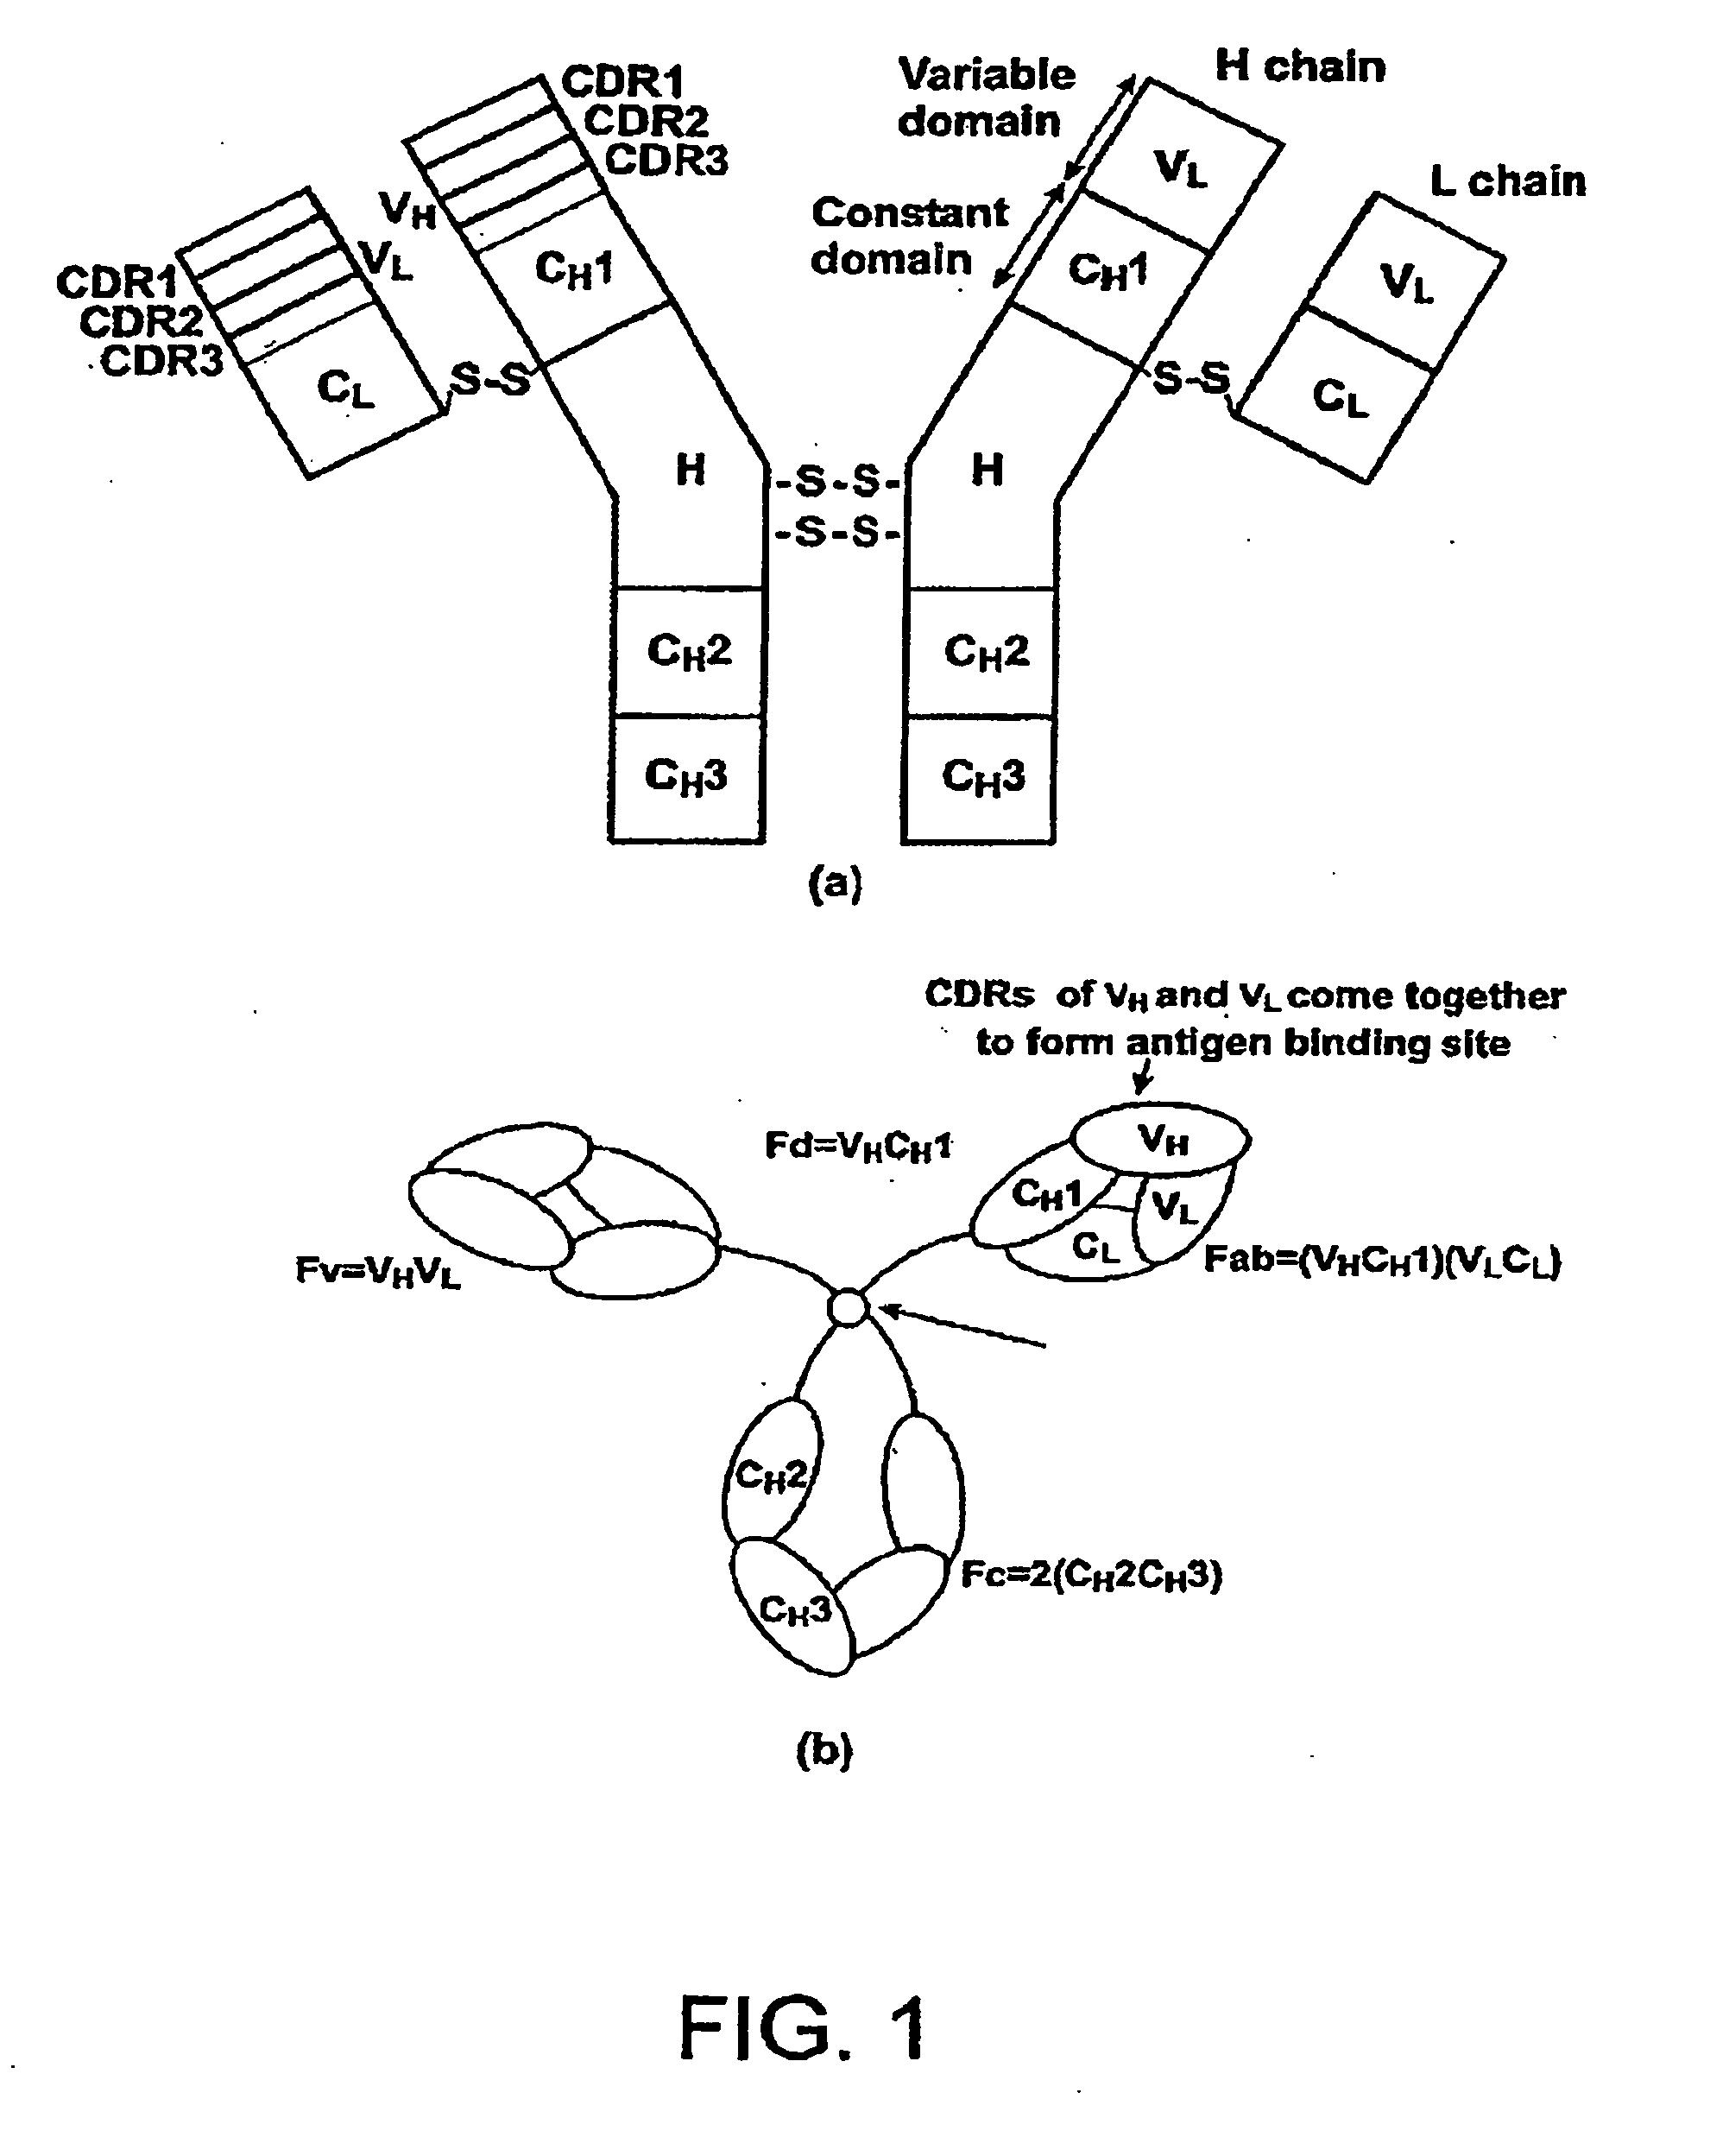 Single-domain Antigen-binding